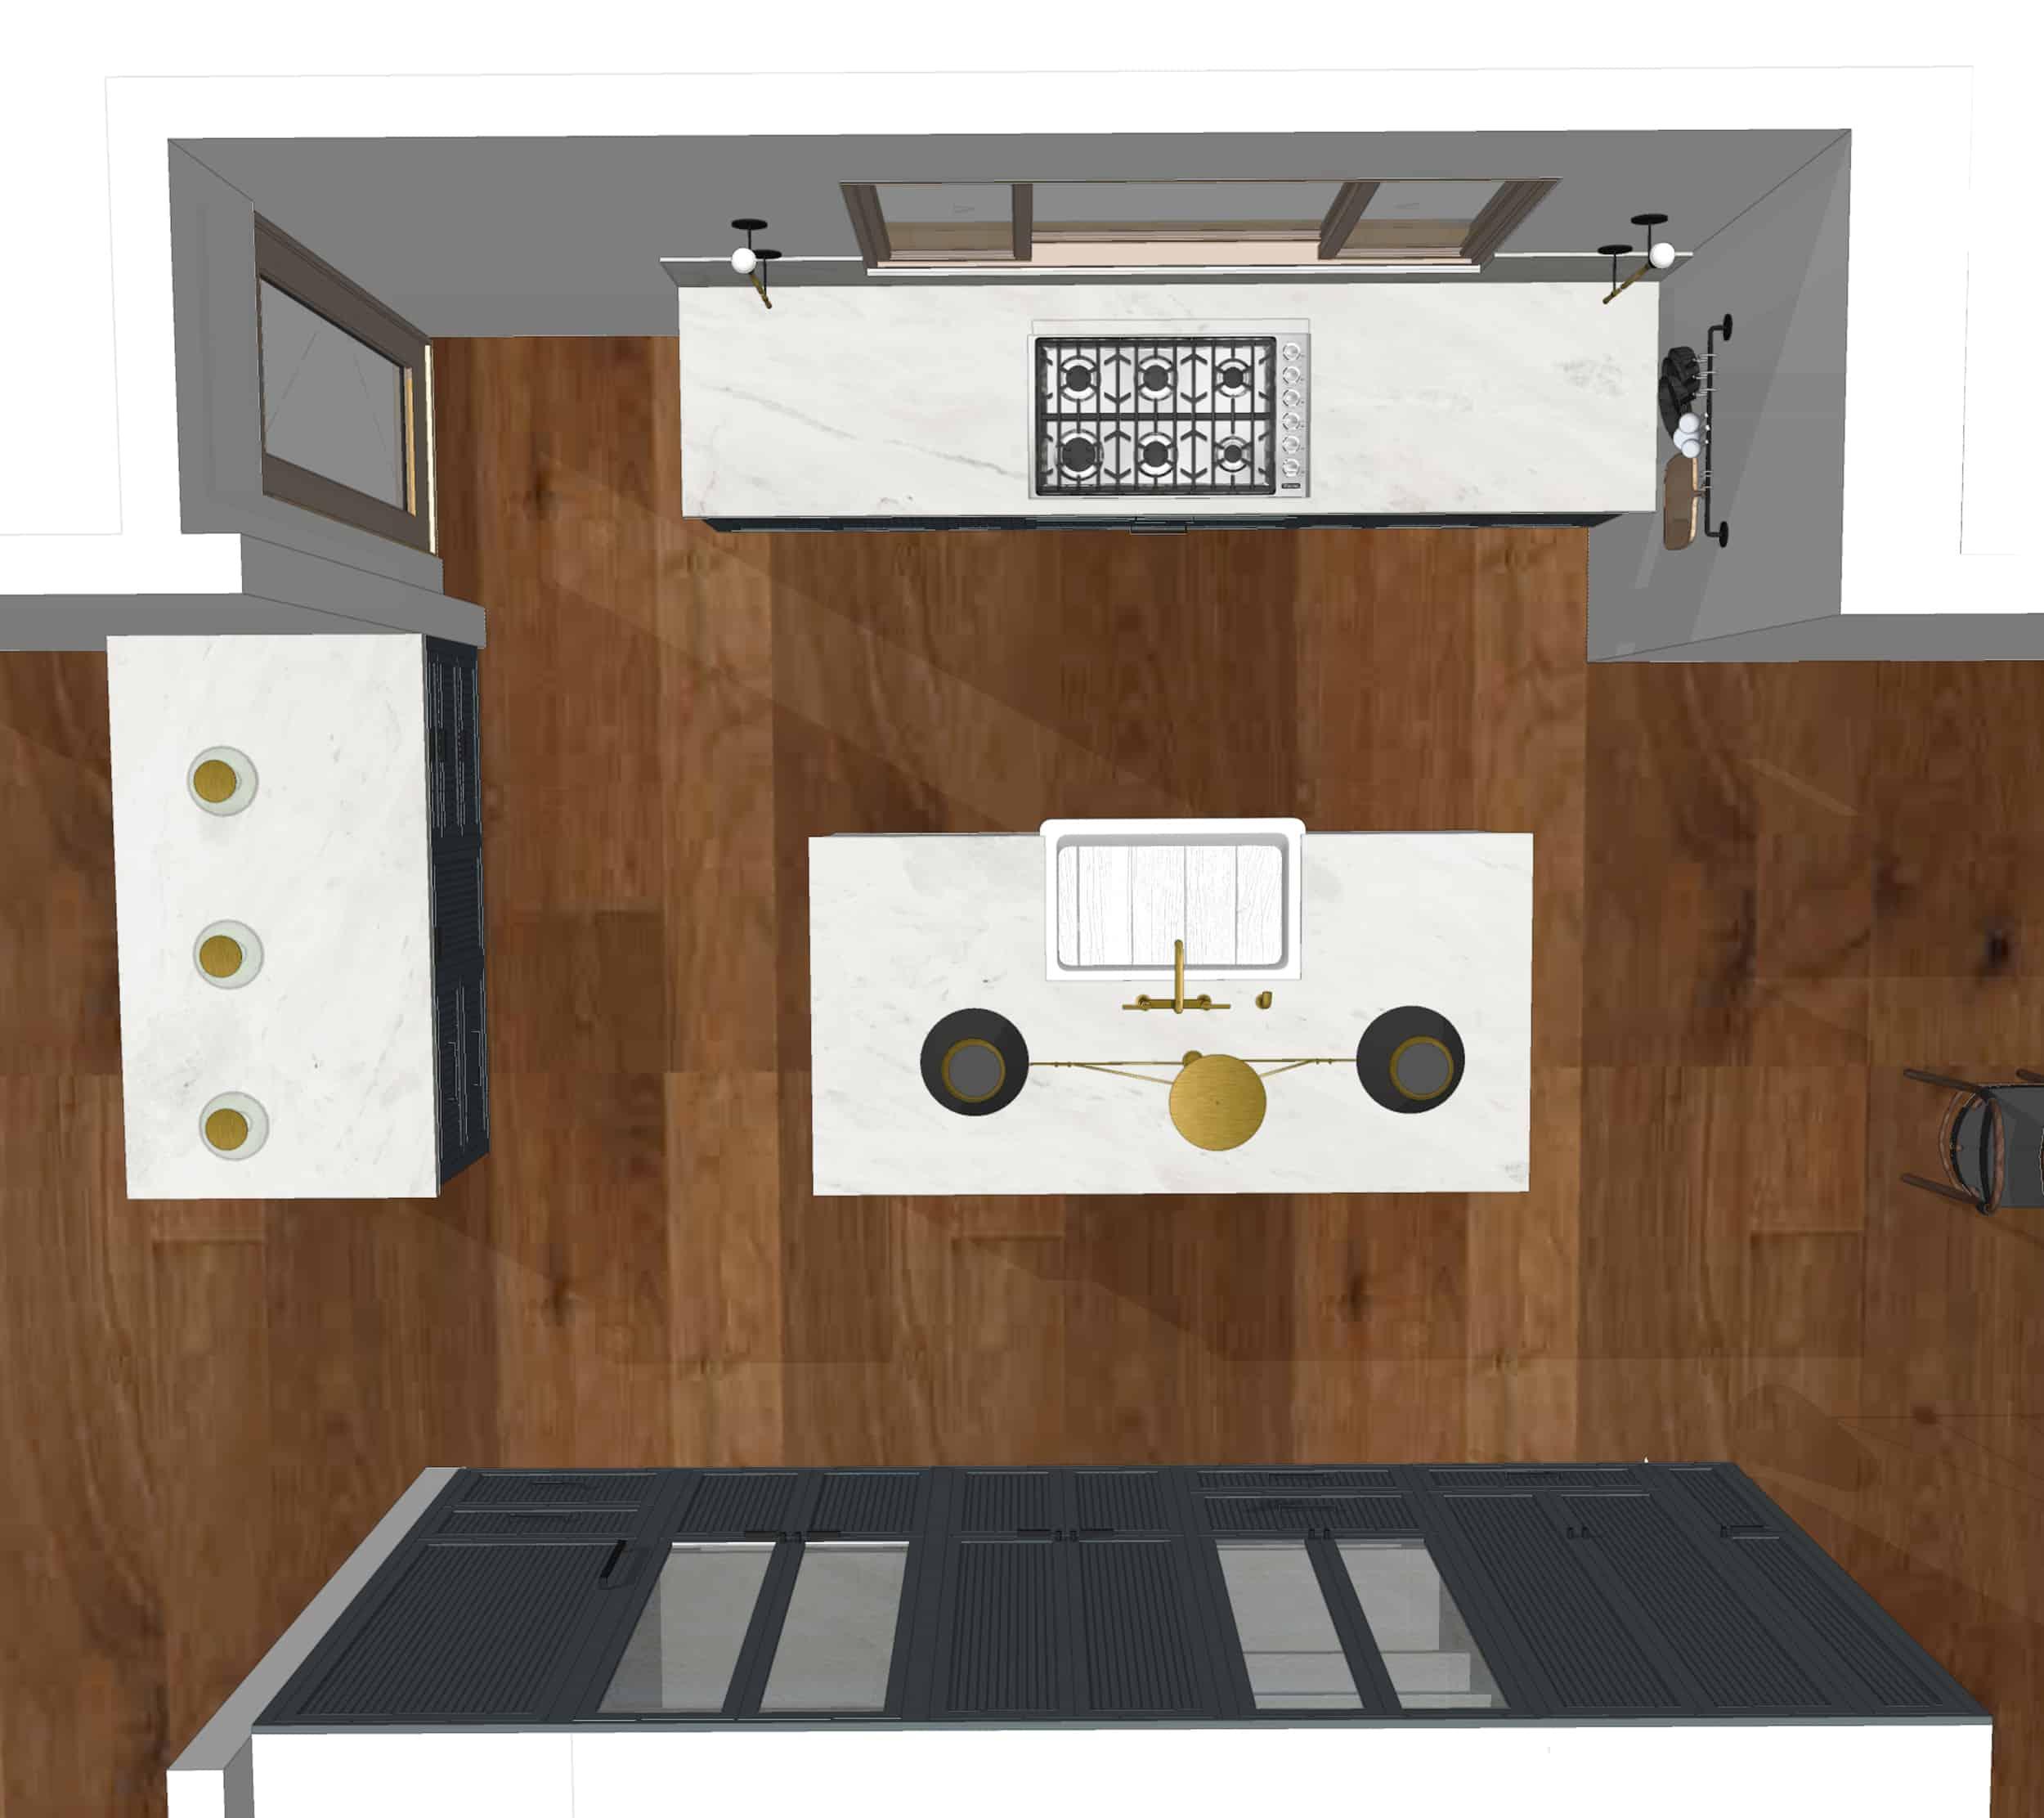 Emily Henderson Mountain Fixer Upper I Design You Decide Kitchen Render Plan 6.20.18